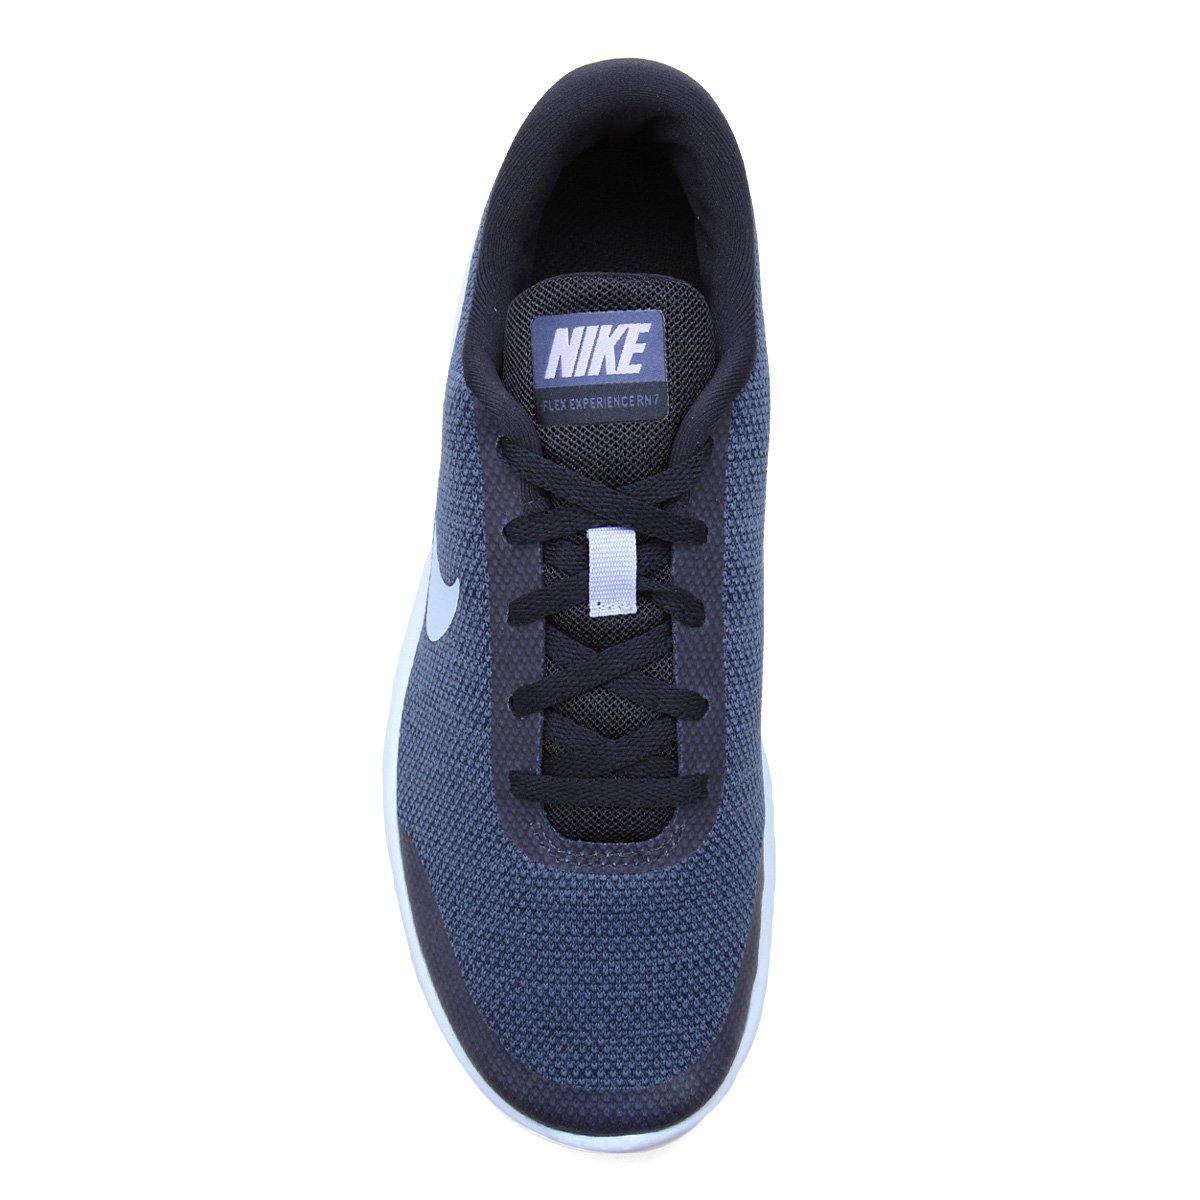 5f79e3422f Tênis Nike Flex Experience RN 7 Feminino - Azul e Cinza - Compre ...